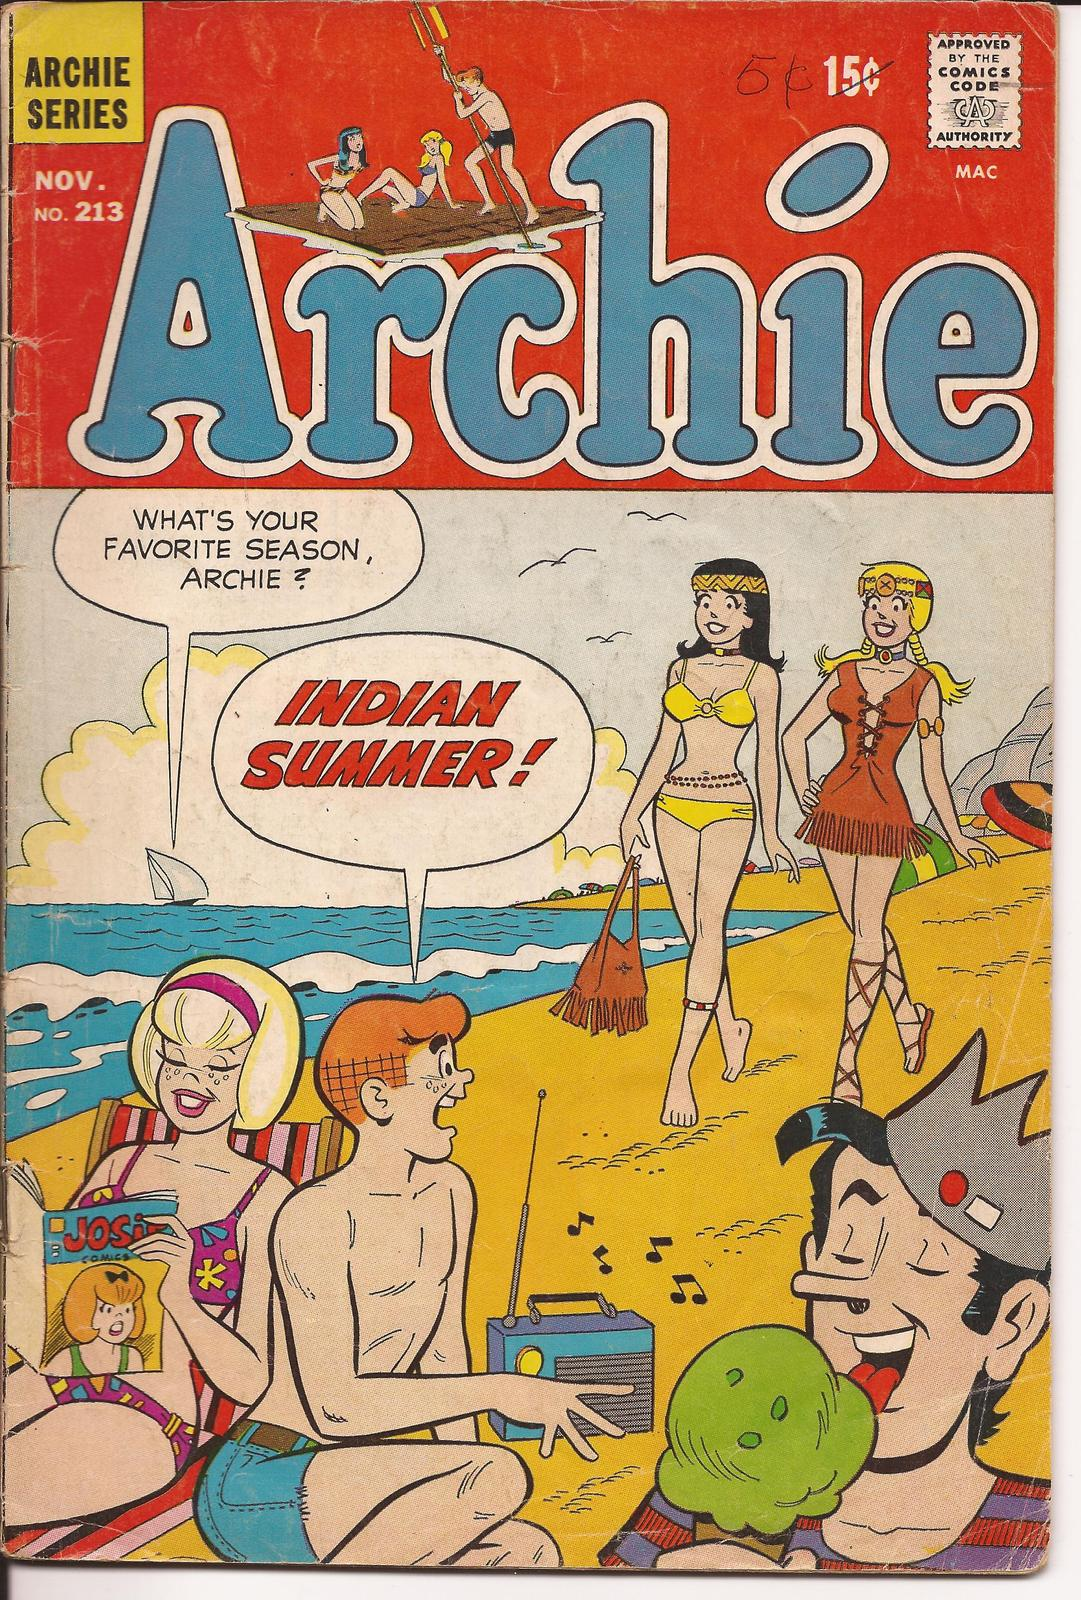 Reggie and Me #34 (Archie Series)